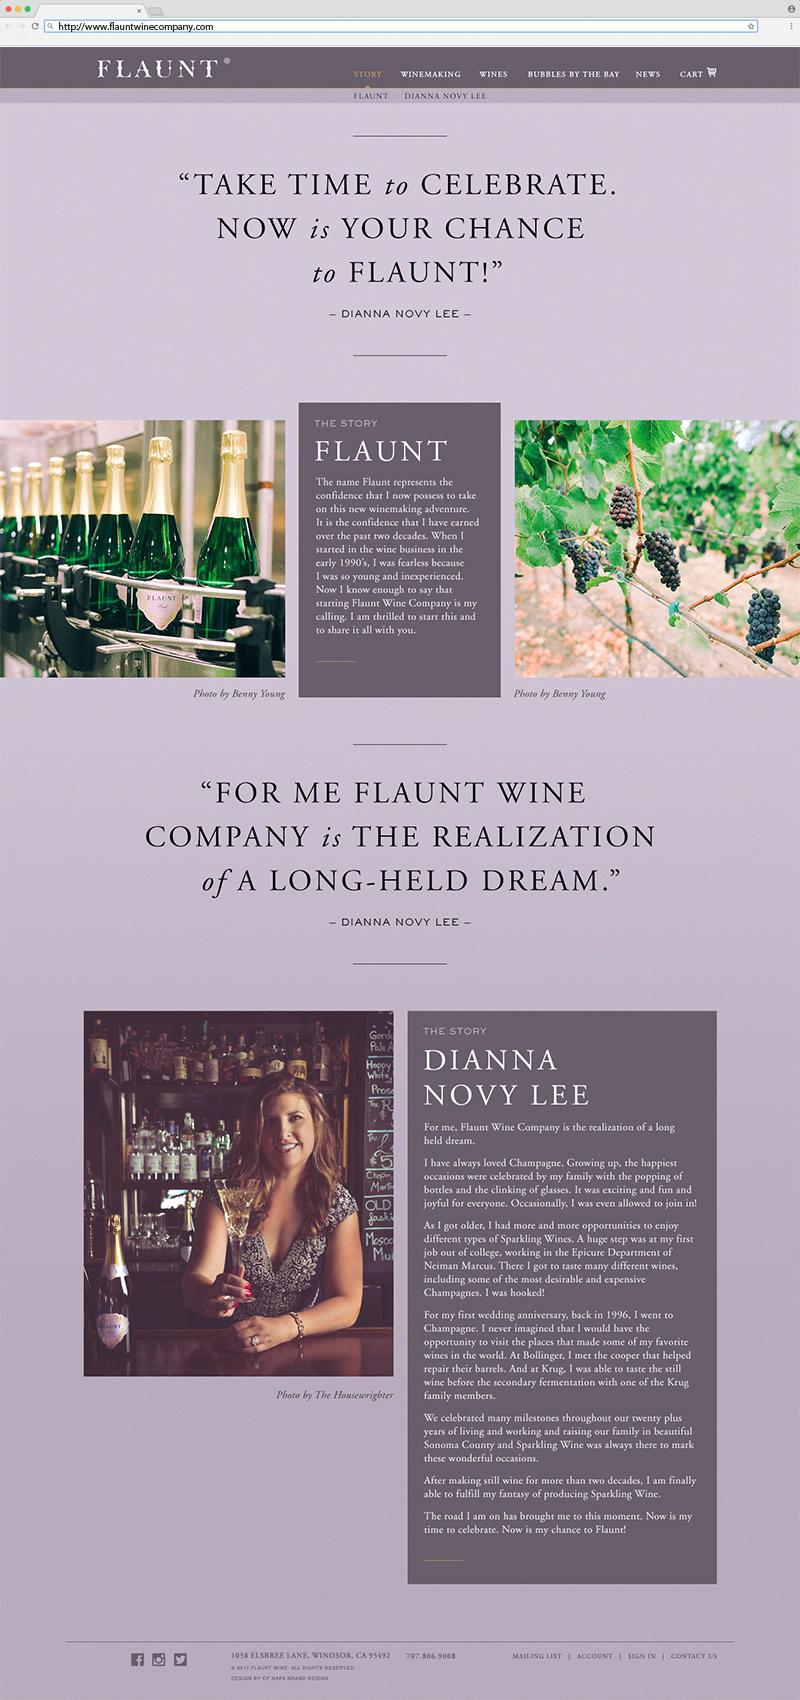 Flaunt Wine Company